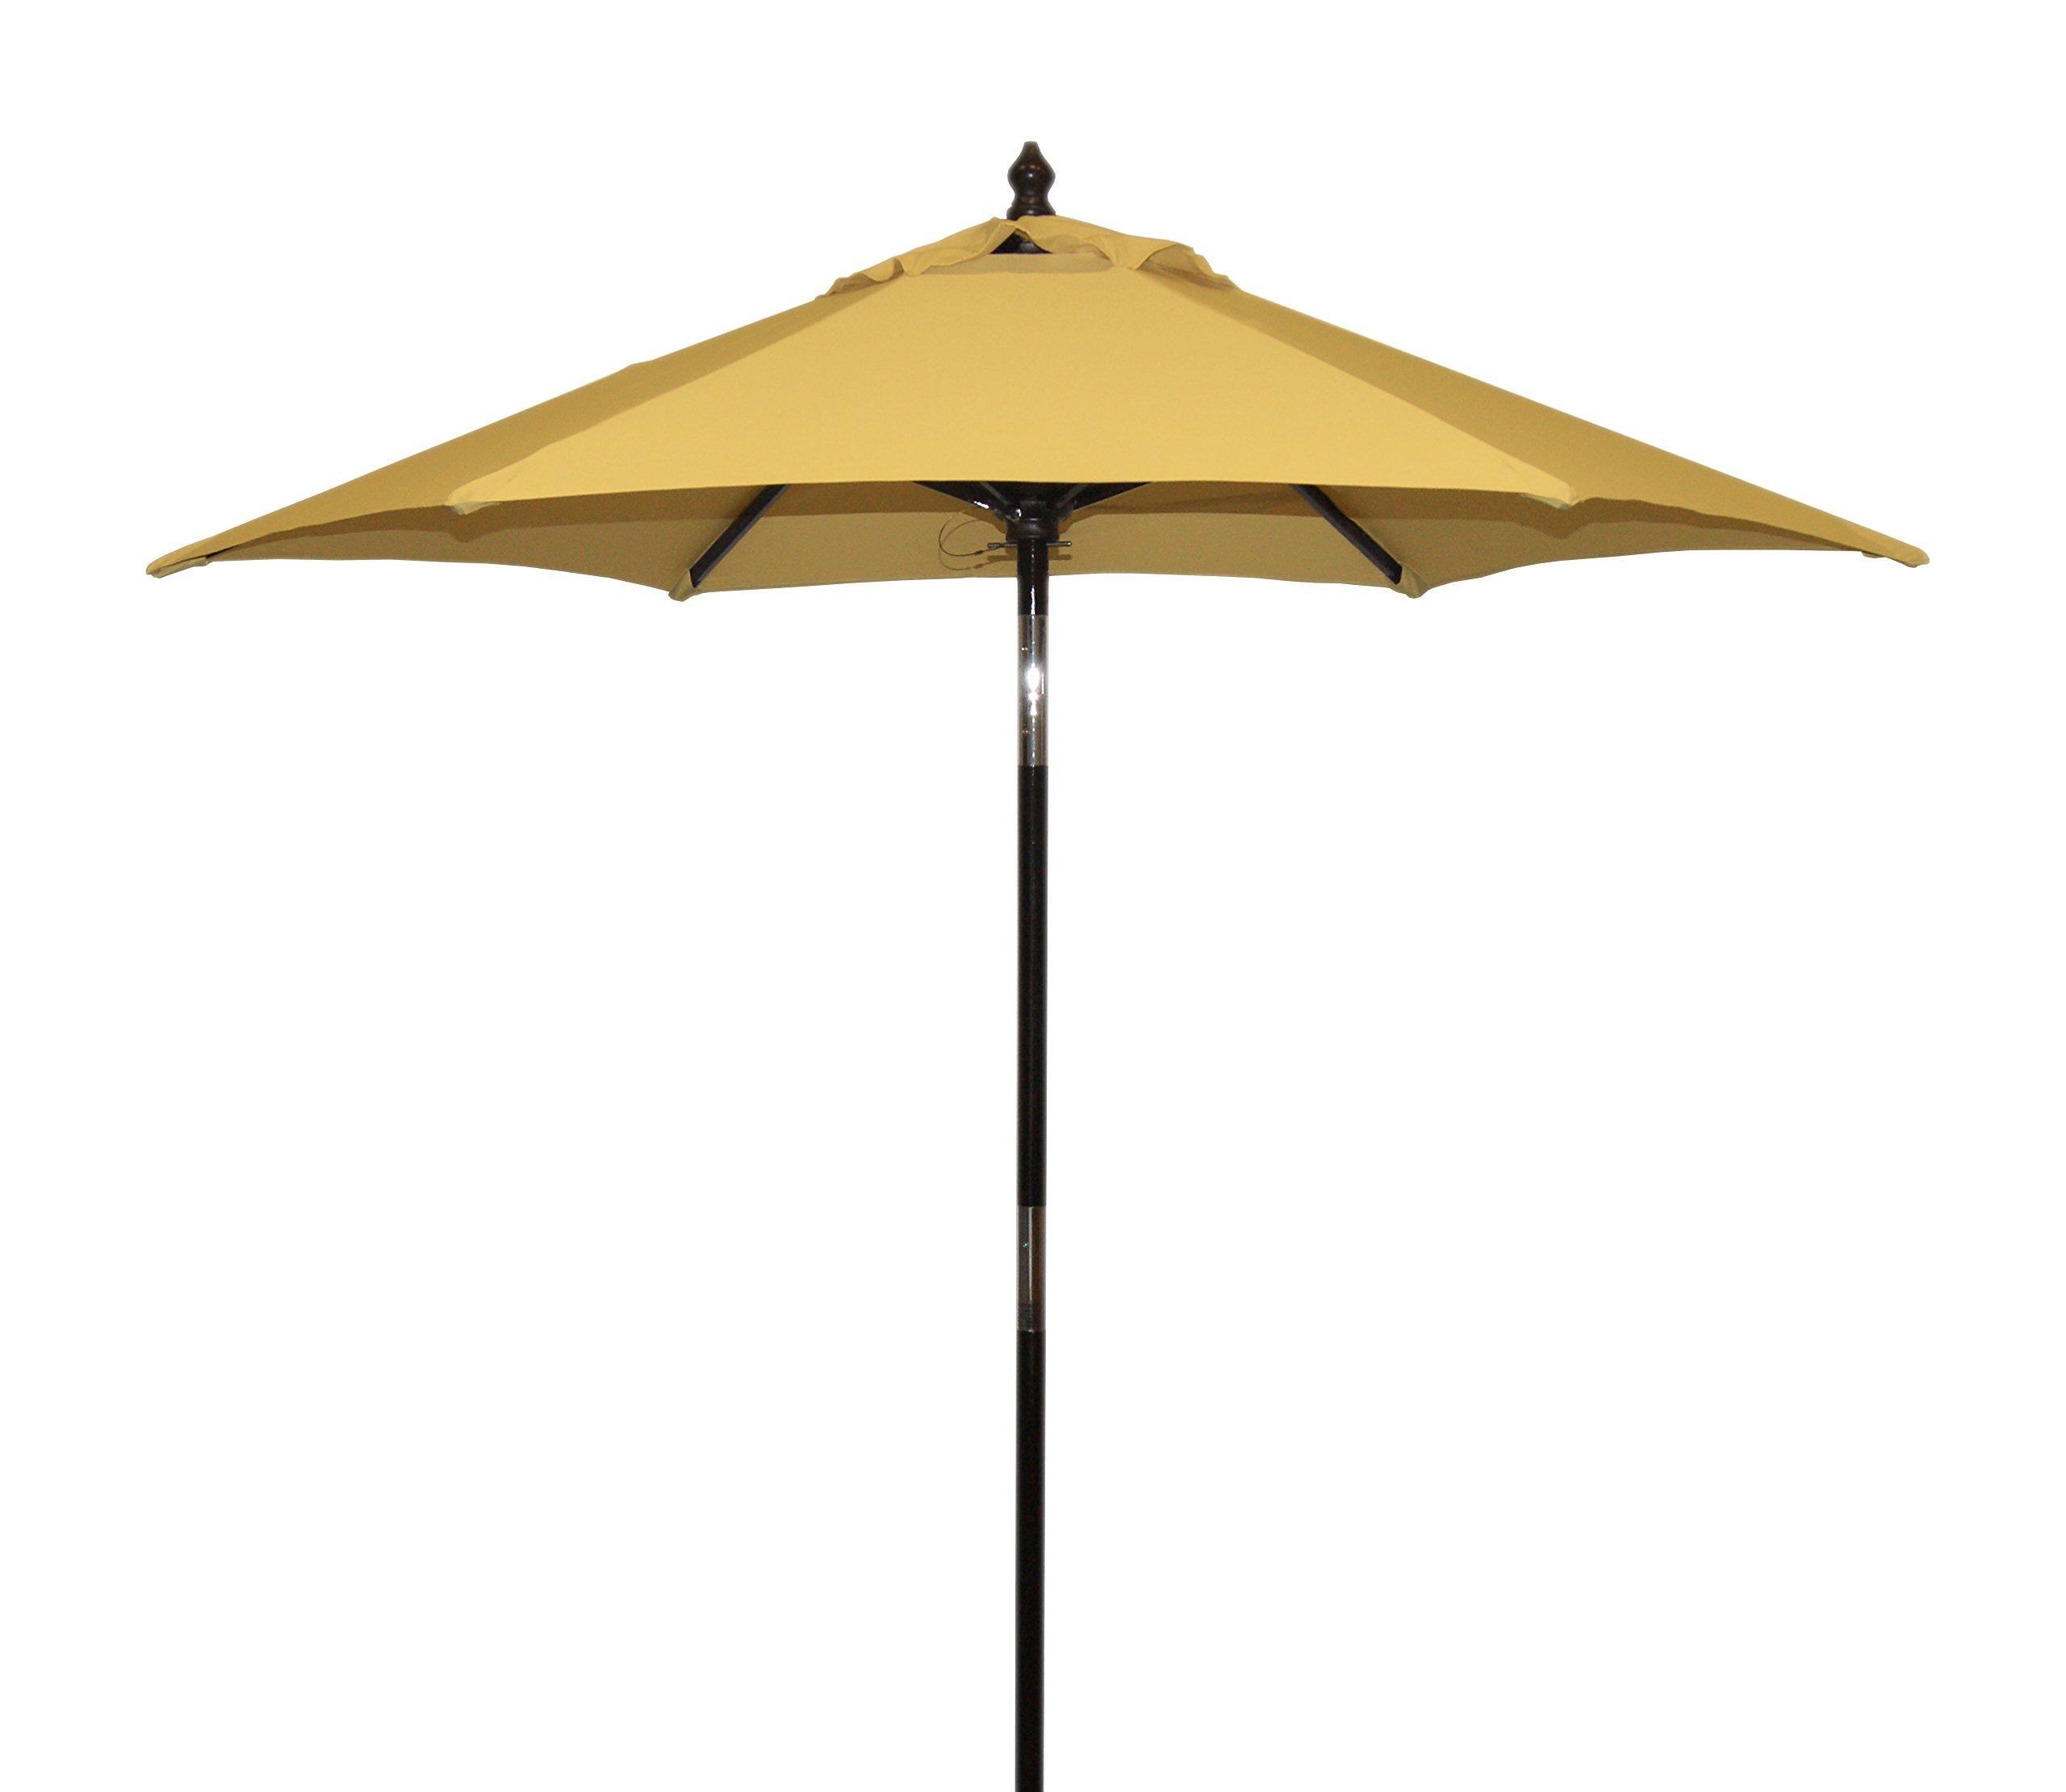 "MJJ Sales, 6.5ft Wood Tilt - Yellow - 7 oz Polyester - 9 Colors Available Approx. 1 3/8"" Pole Diameter 6 Dark Cherry Wood Ribs - shades-parasols, patio-furniture, patio - 710pZ6f u9L -"